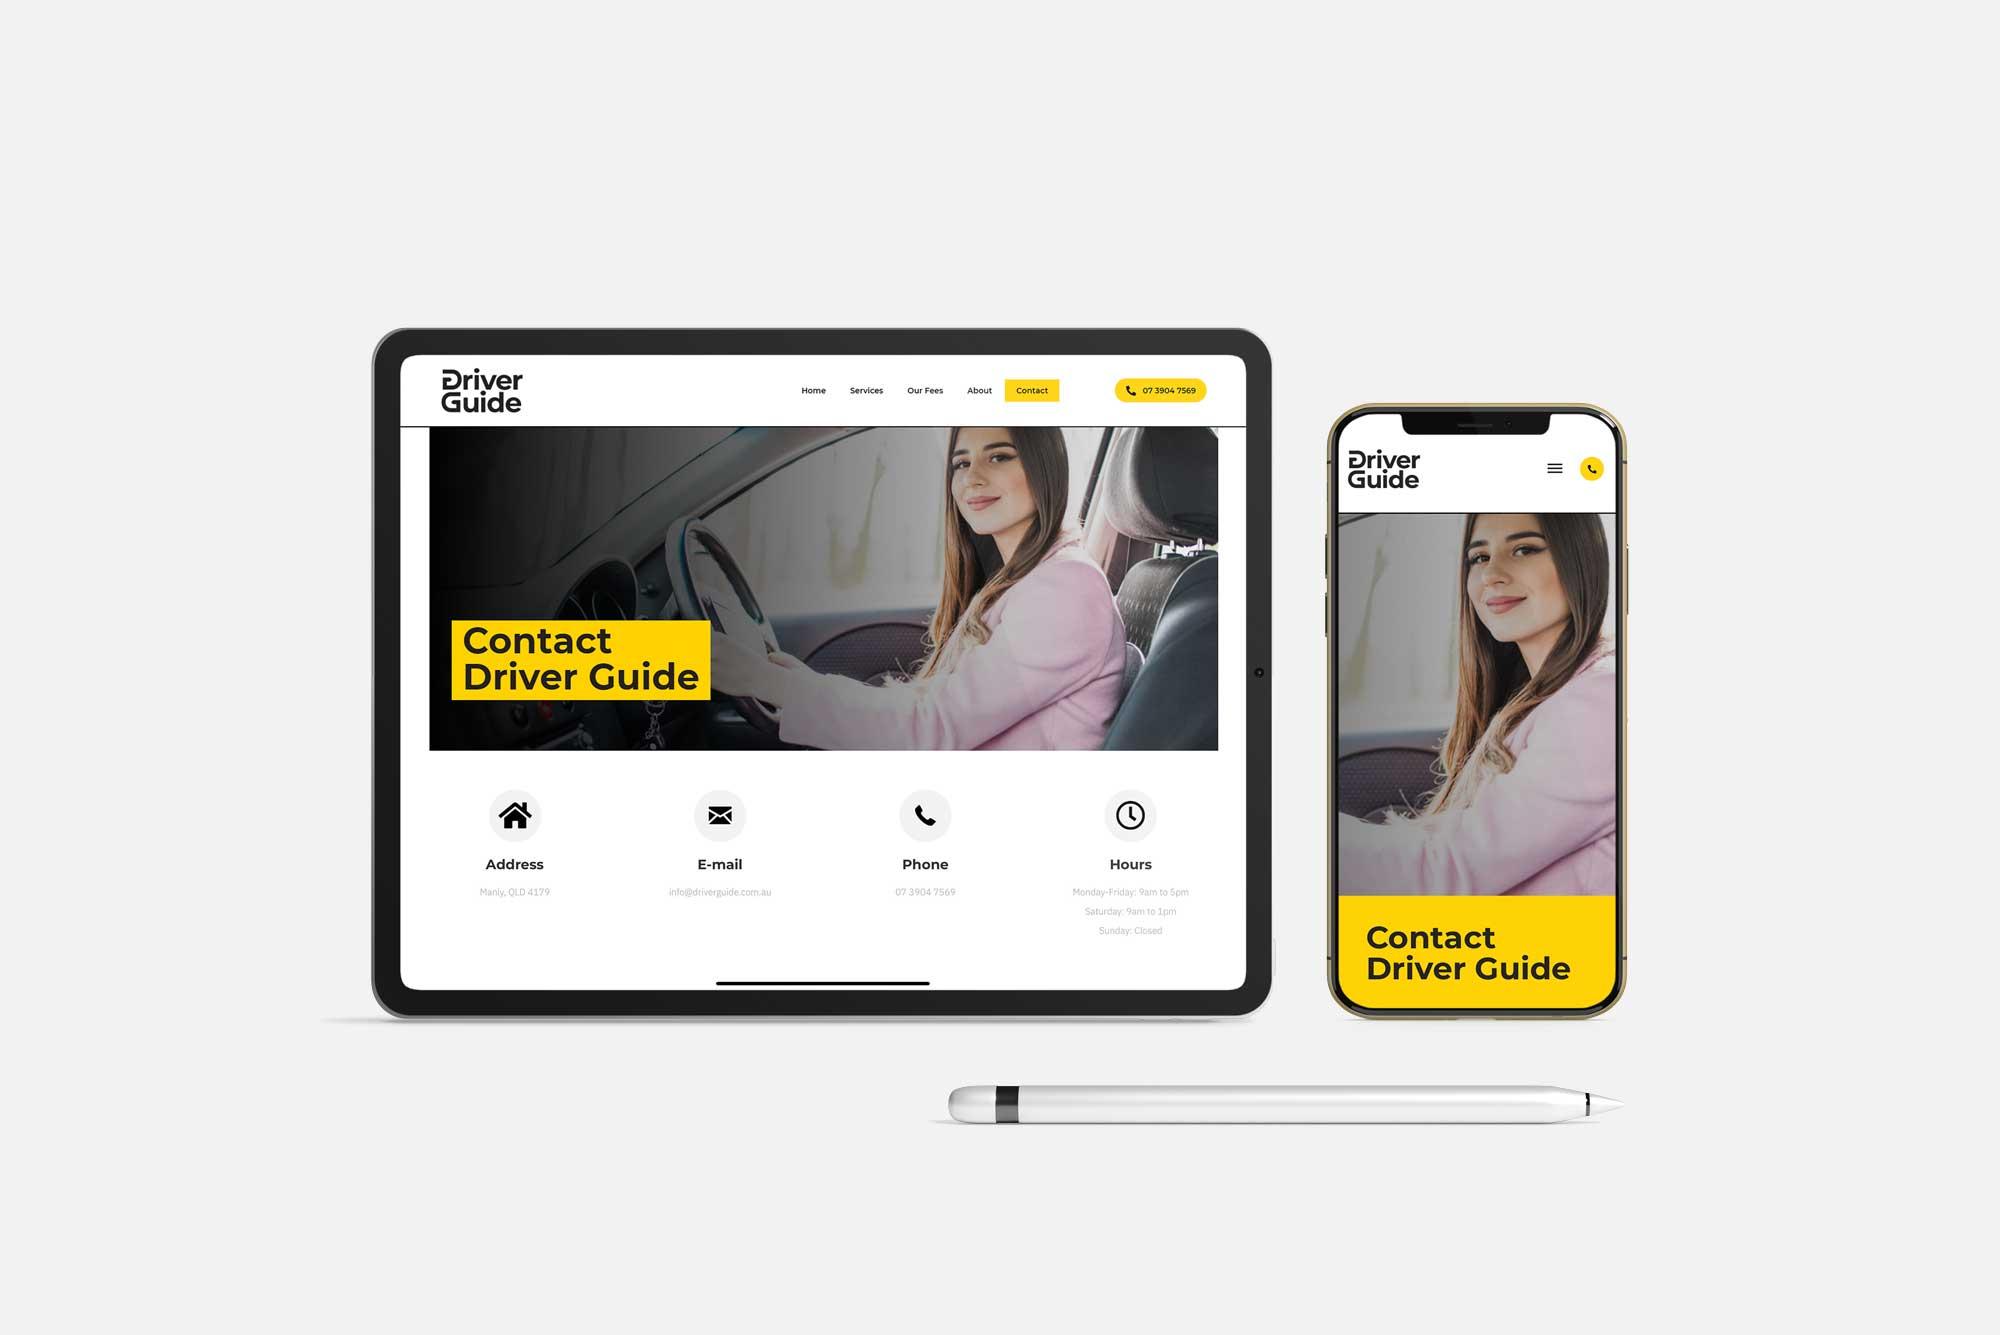 Driver_Guide_4